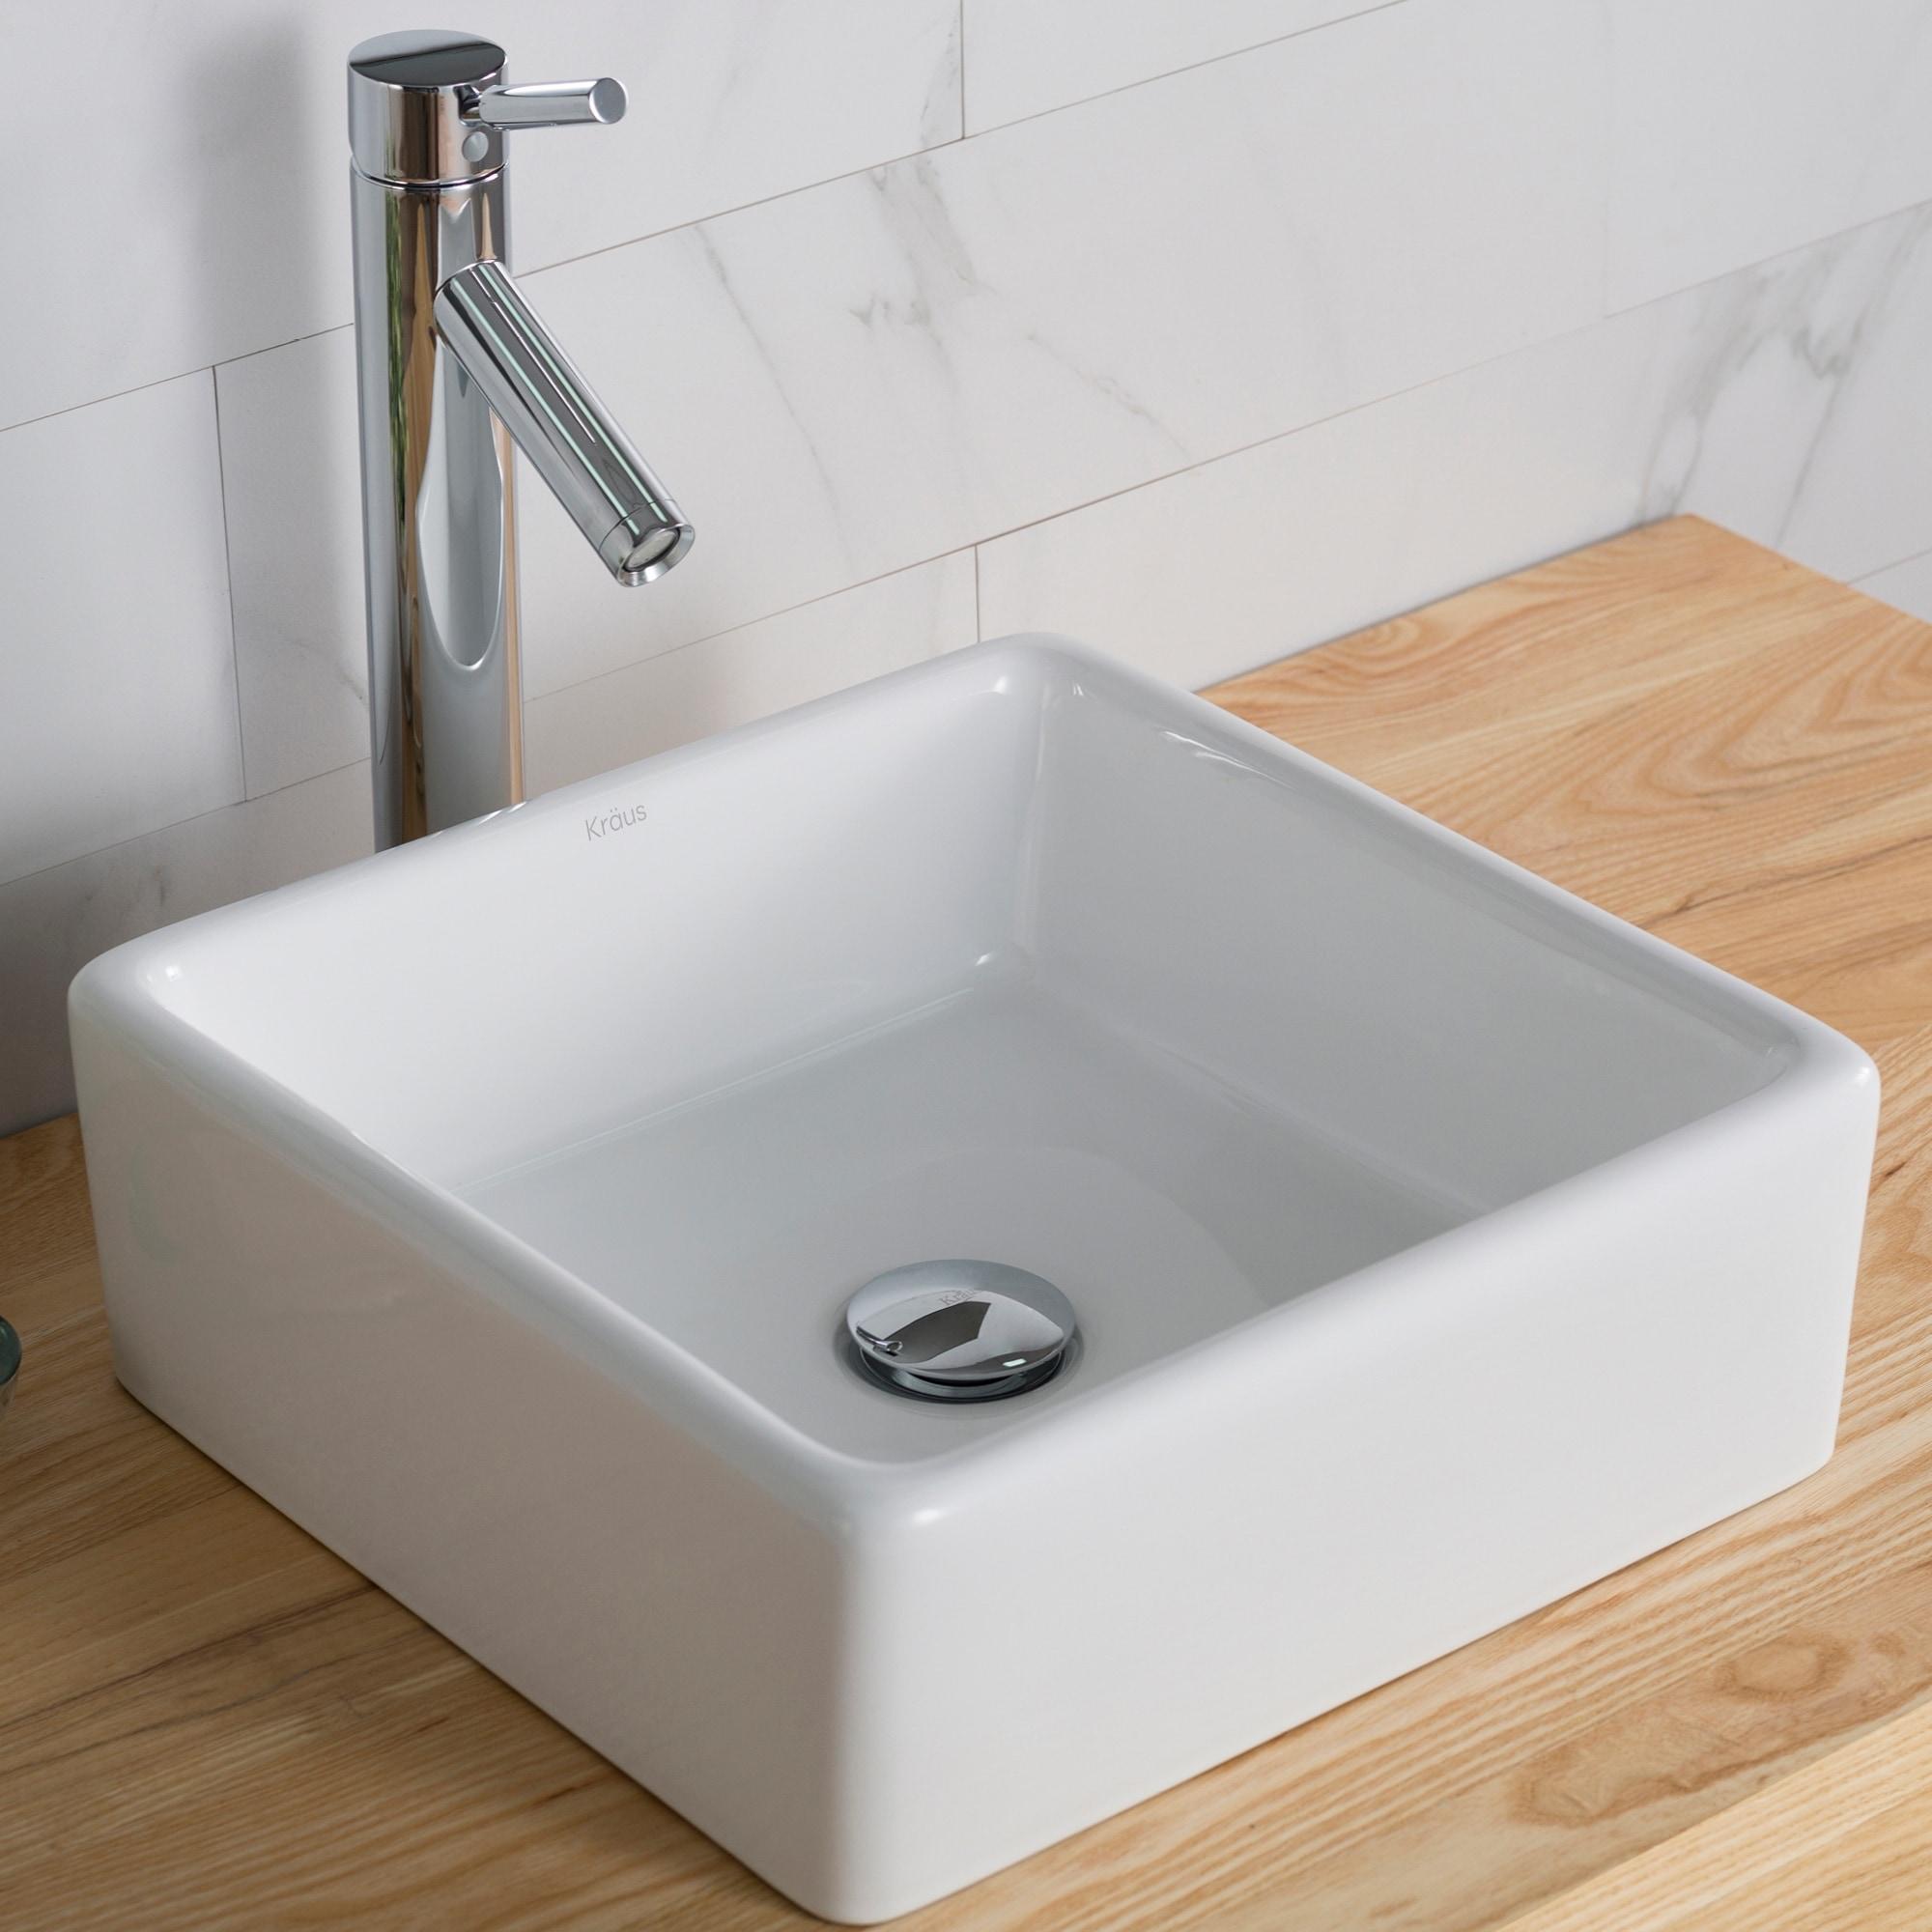 Kraus Elavo 15 Inch Square Porcelain Ceramic Vessel Bathroom Sink Overstock 3250160